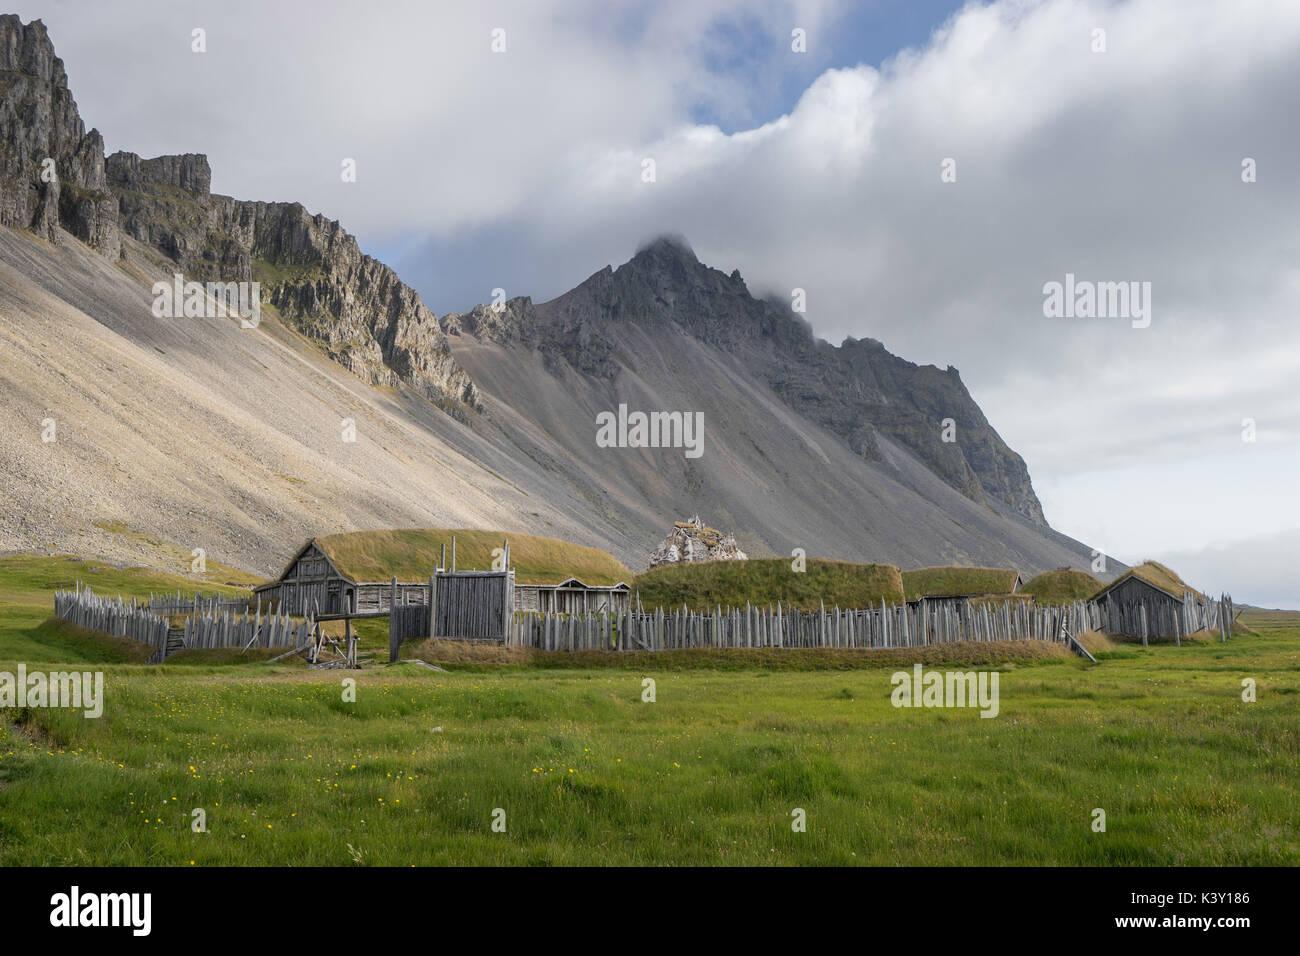 Abandoned Viking village movie set in front of Vestrahorn mountain, Iceland. - Stock Image